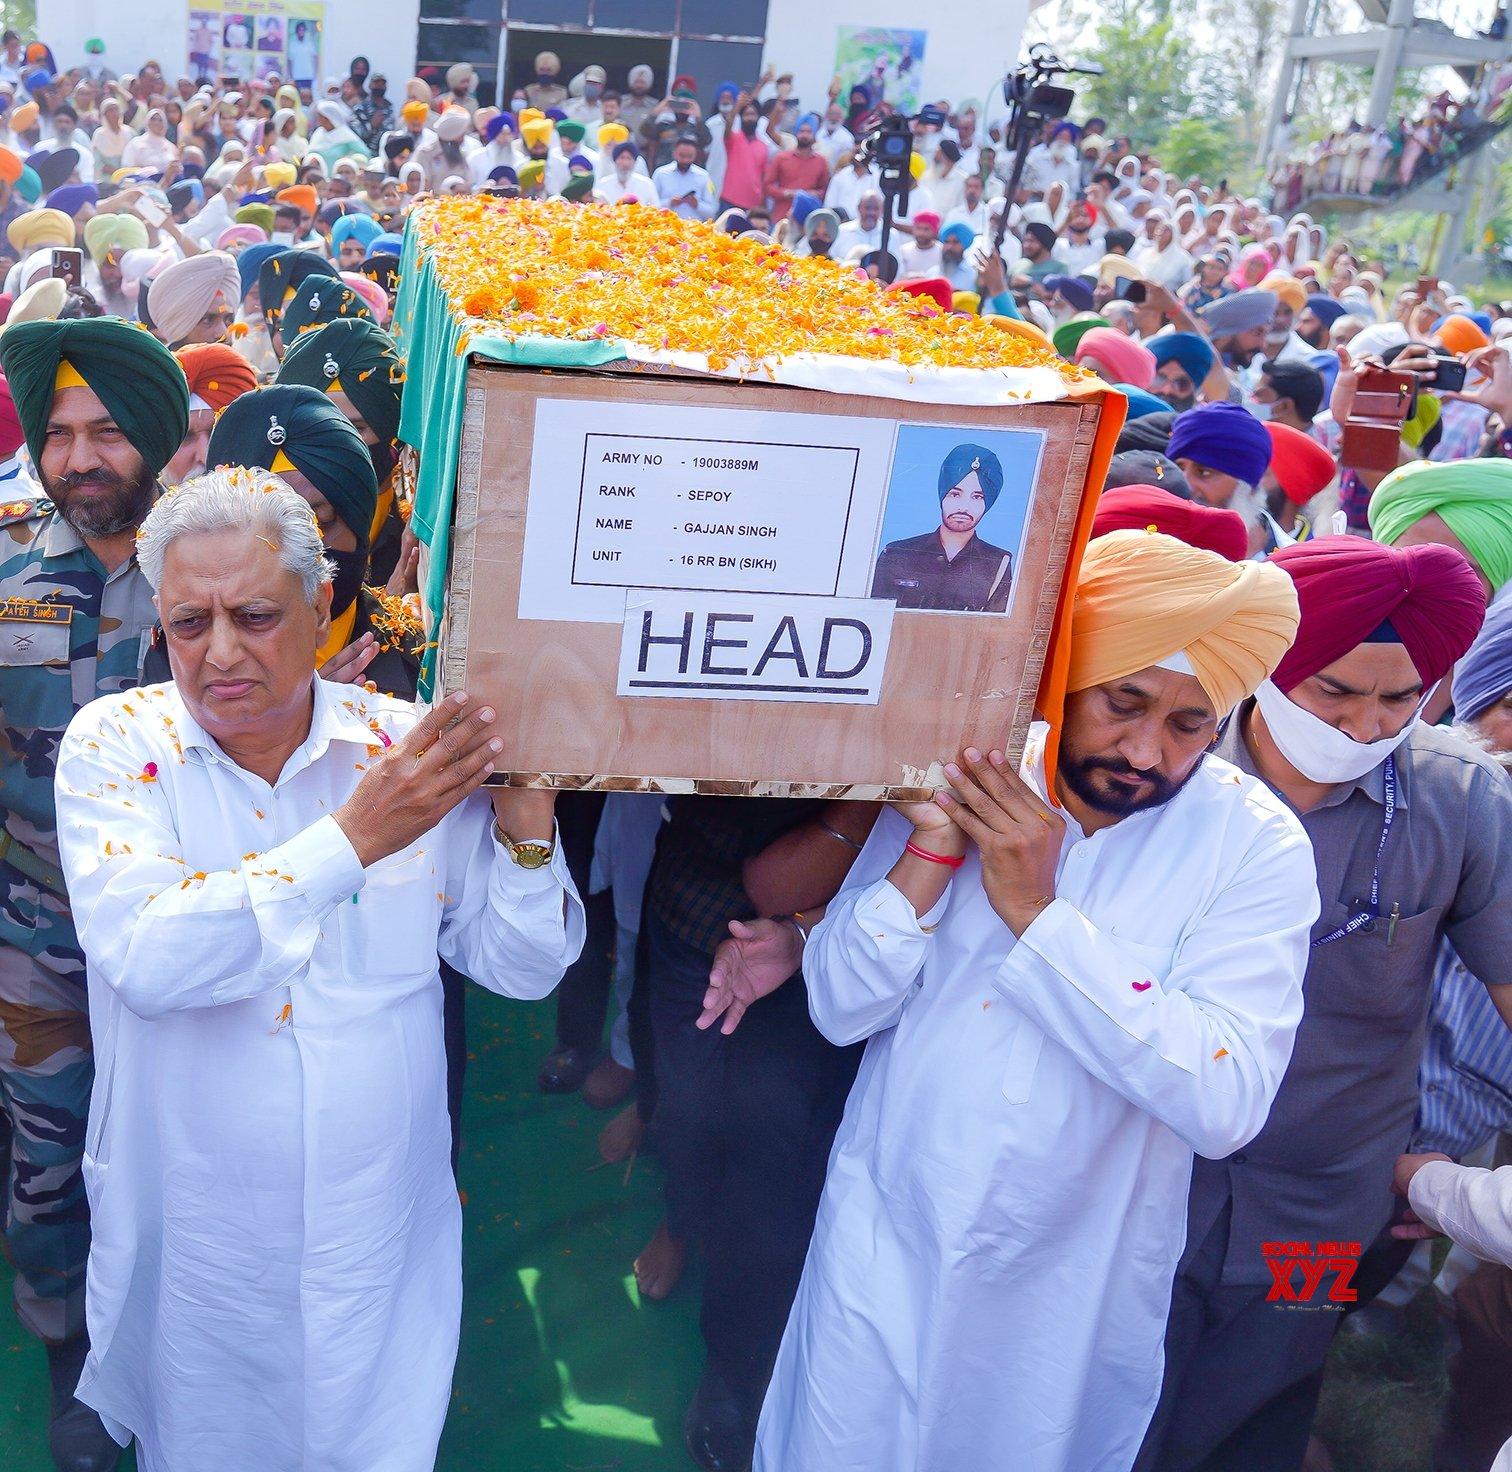 Amritsar:Punjab CM Charanjit Singh Channi participating in the funeral procession of Martyr Sepoy Gajjan Singh during his last rites at his native Village Pachranda,Nupur Bedi in Rupnagar District in Punjab #Gallery